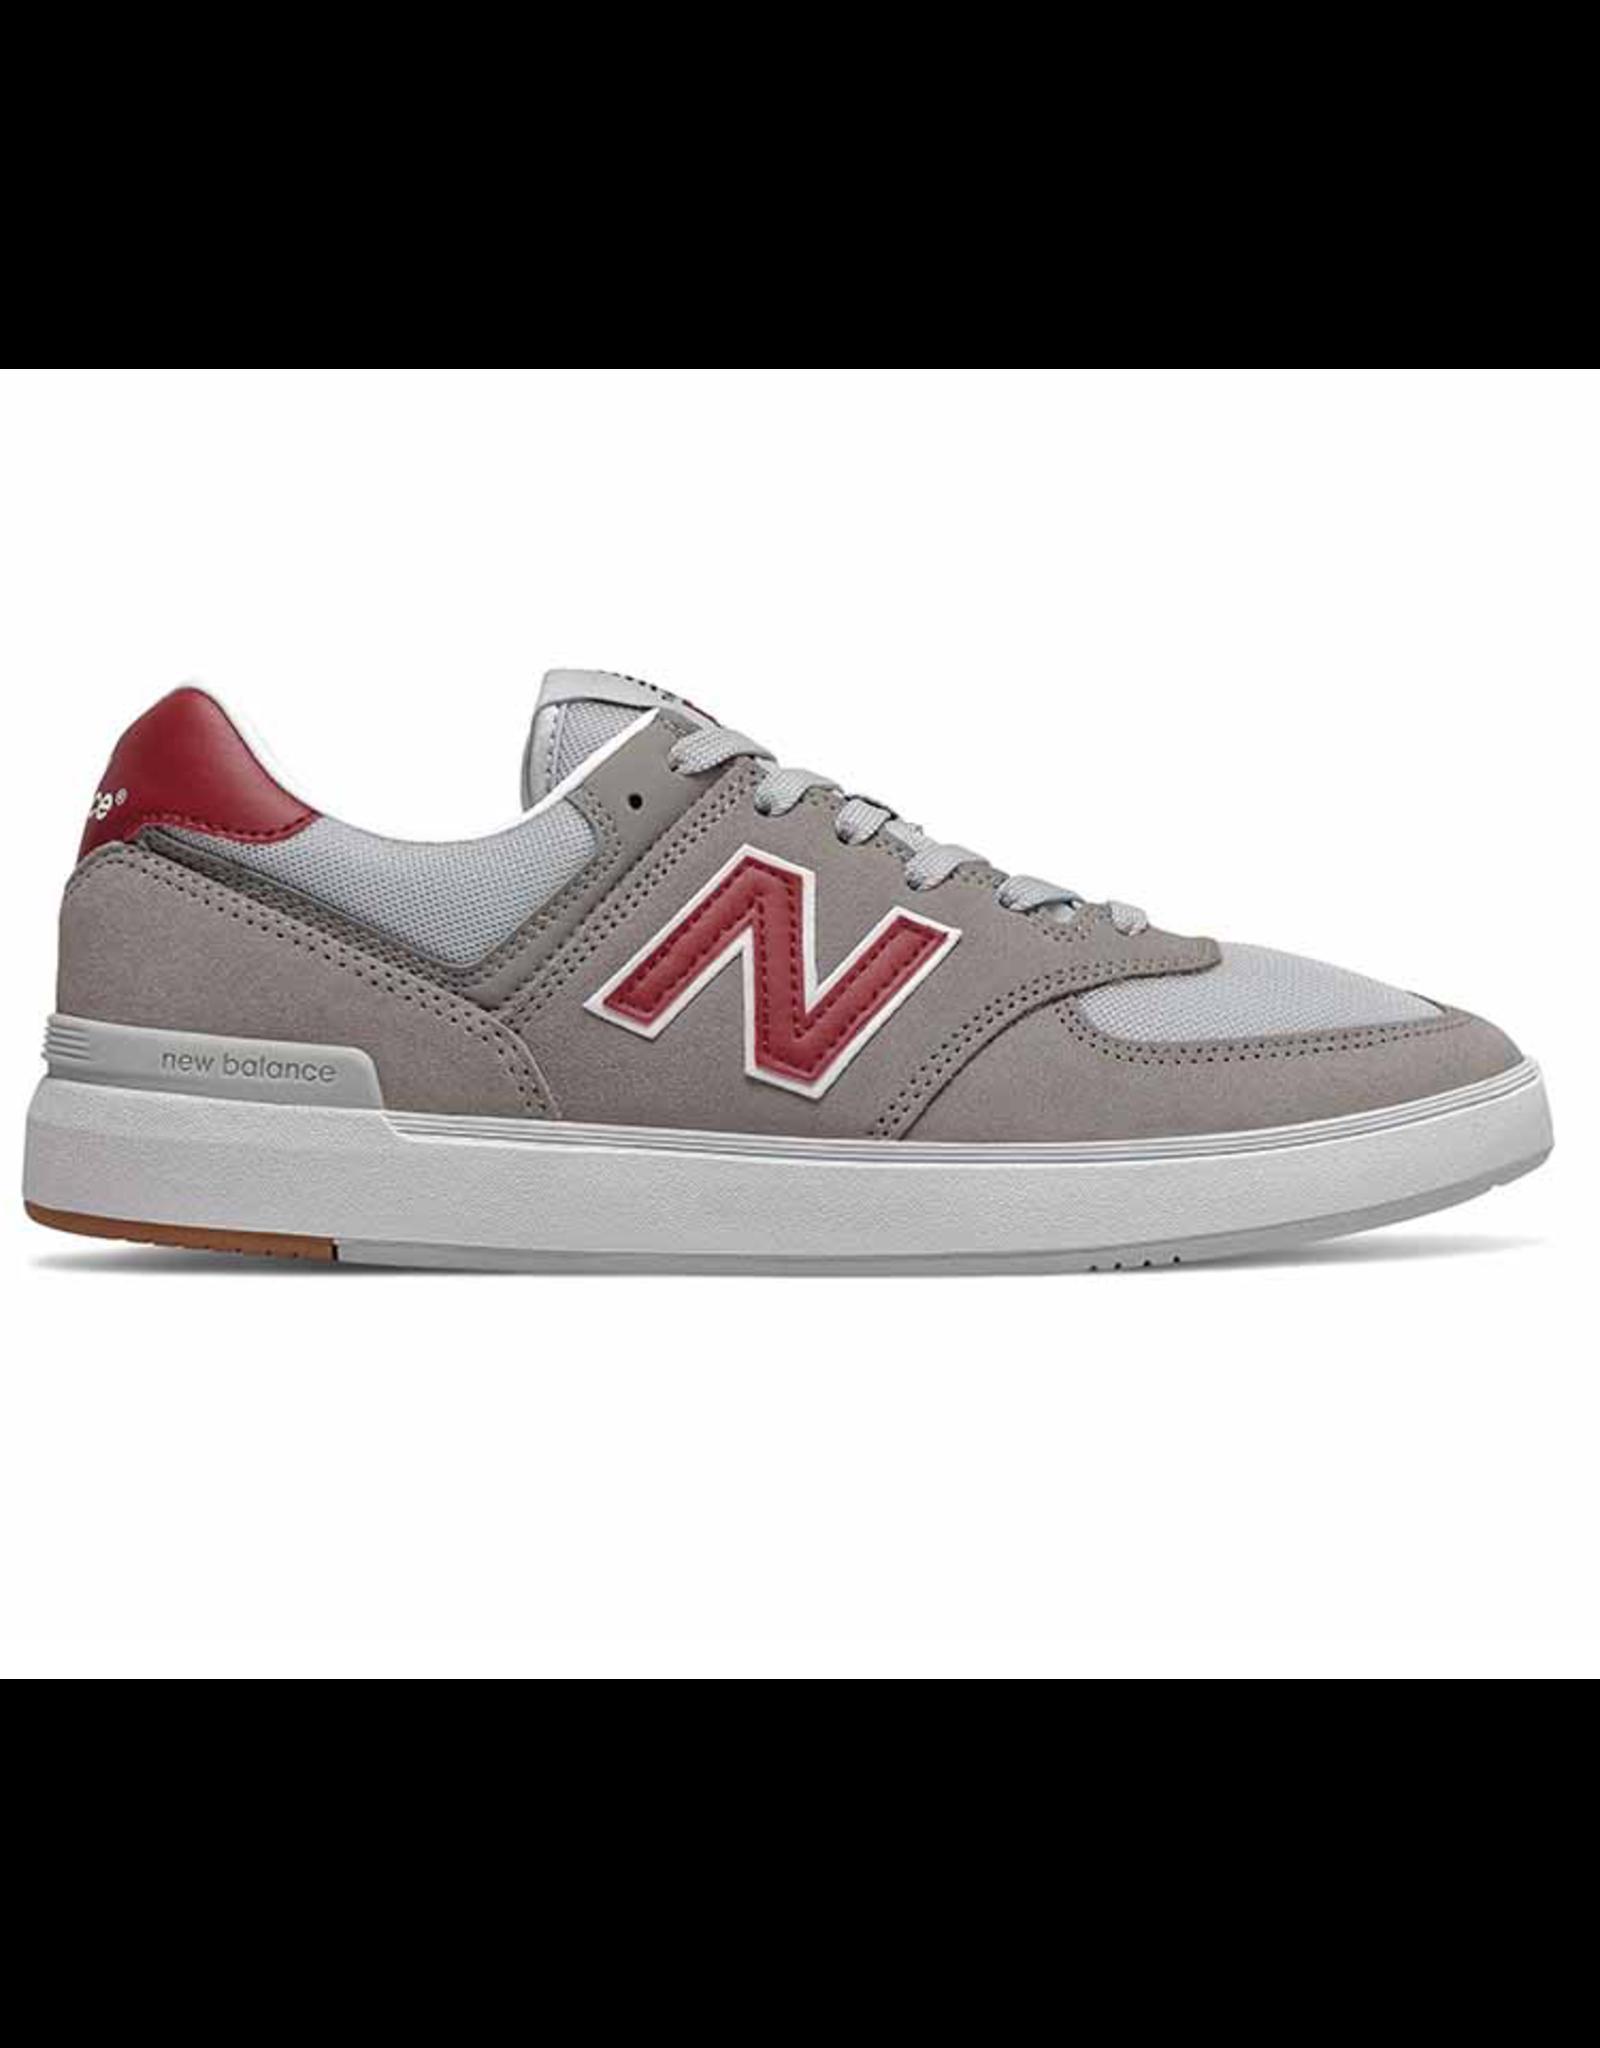 New Balance Numeric 574 - Grey